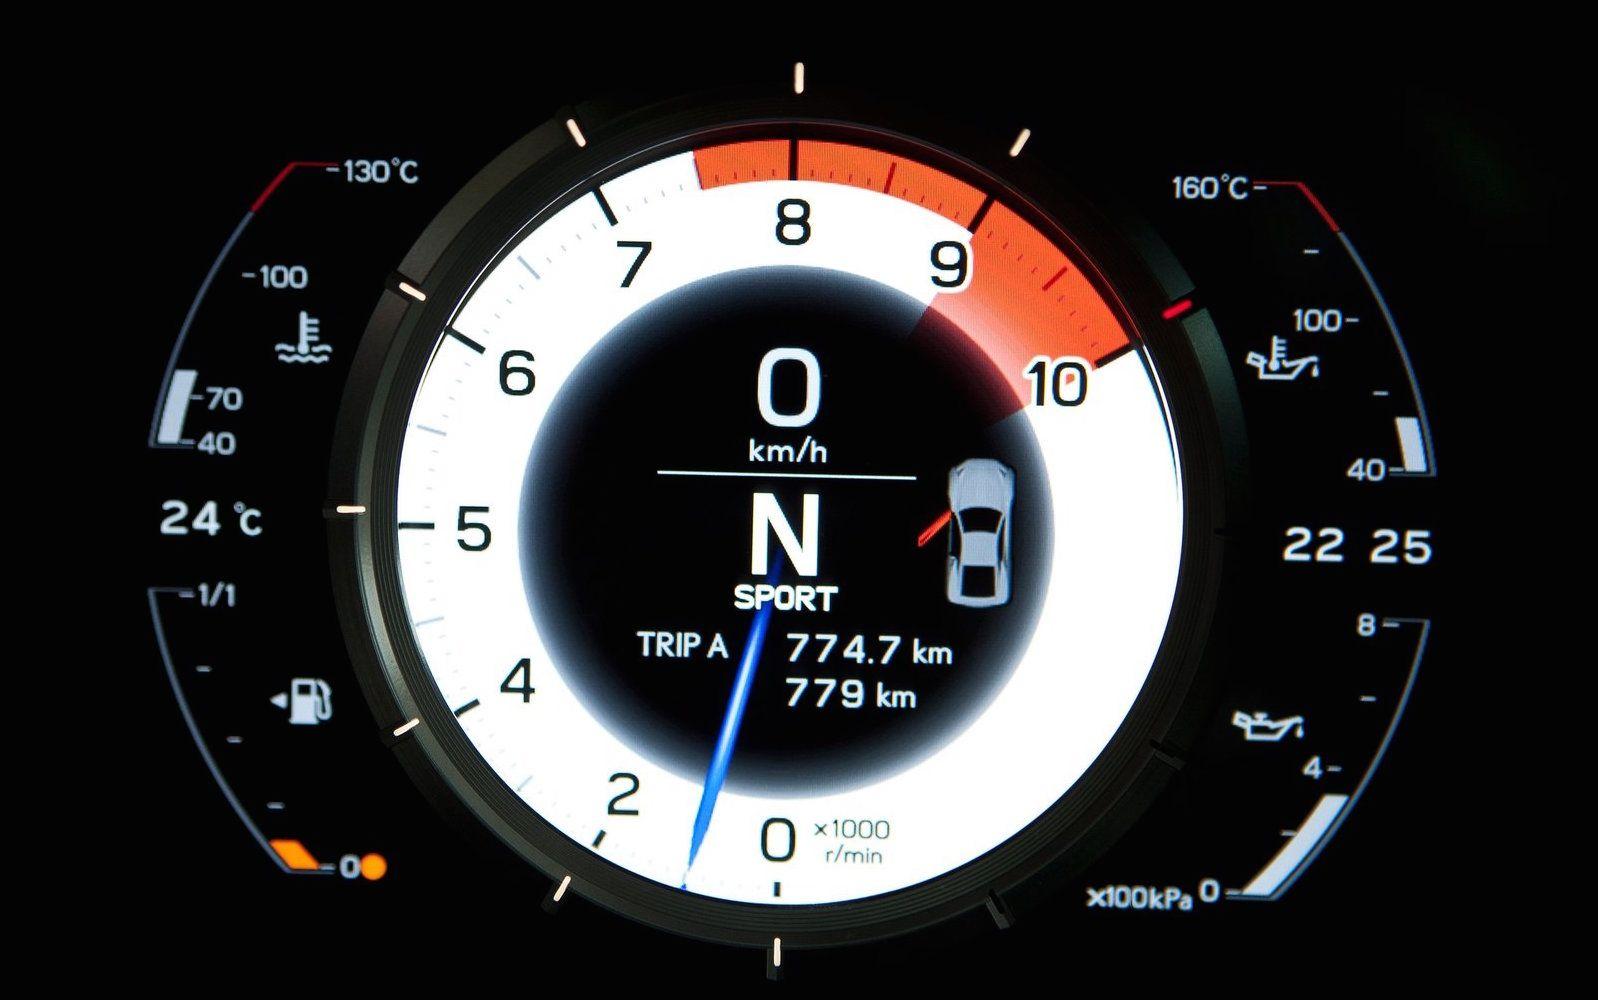 13 Coolest Digital Gauges Ever Made Best Car Dashboard Designs 1968 Camaro Dash Instrument Cluster Circuit Board With Tachometer